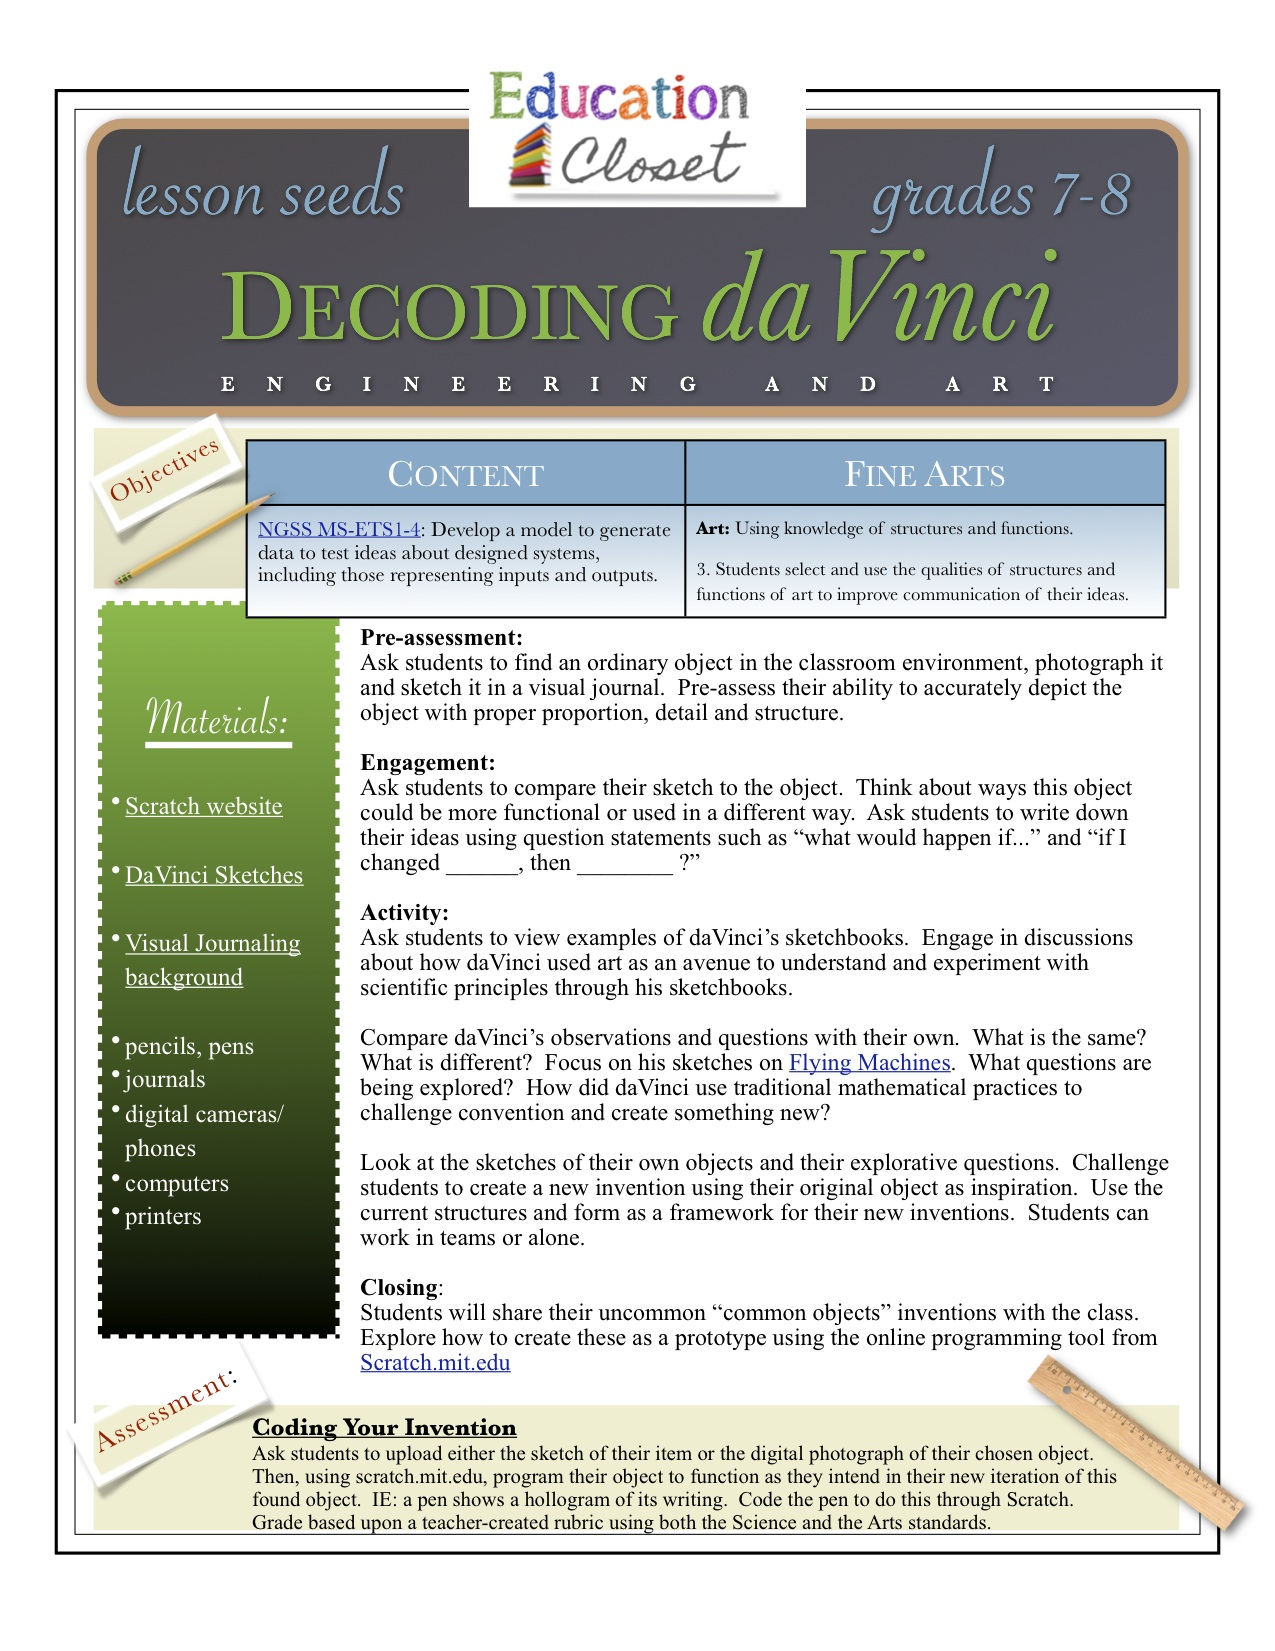 decoding davinci